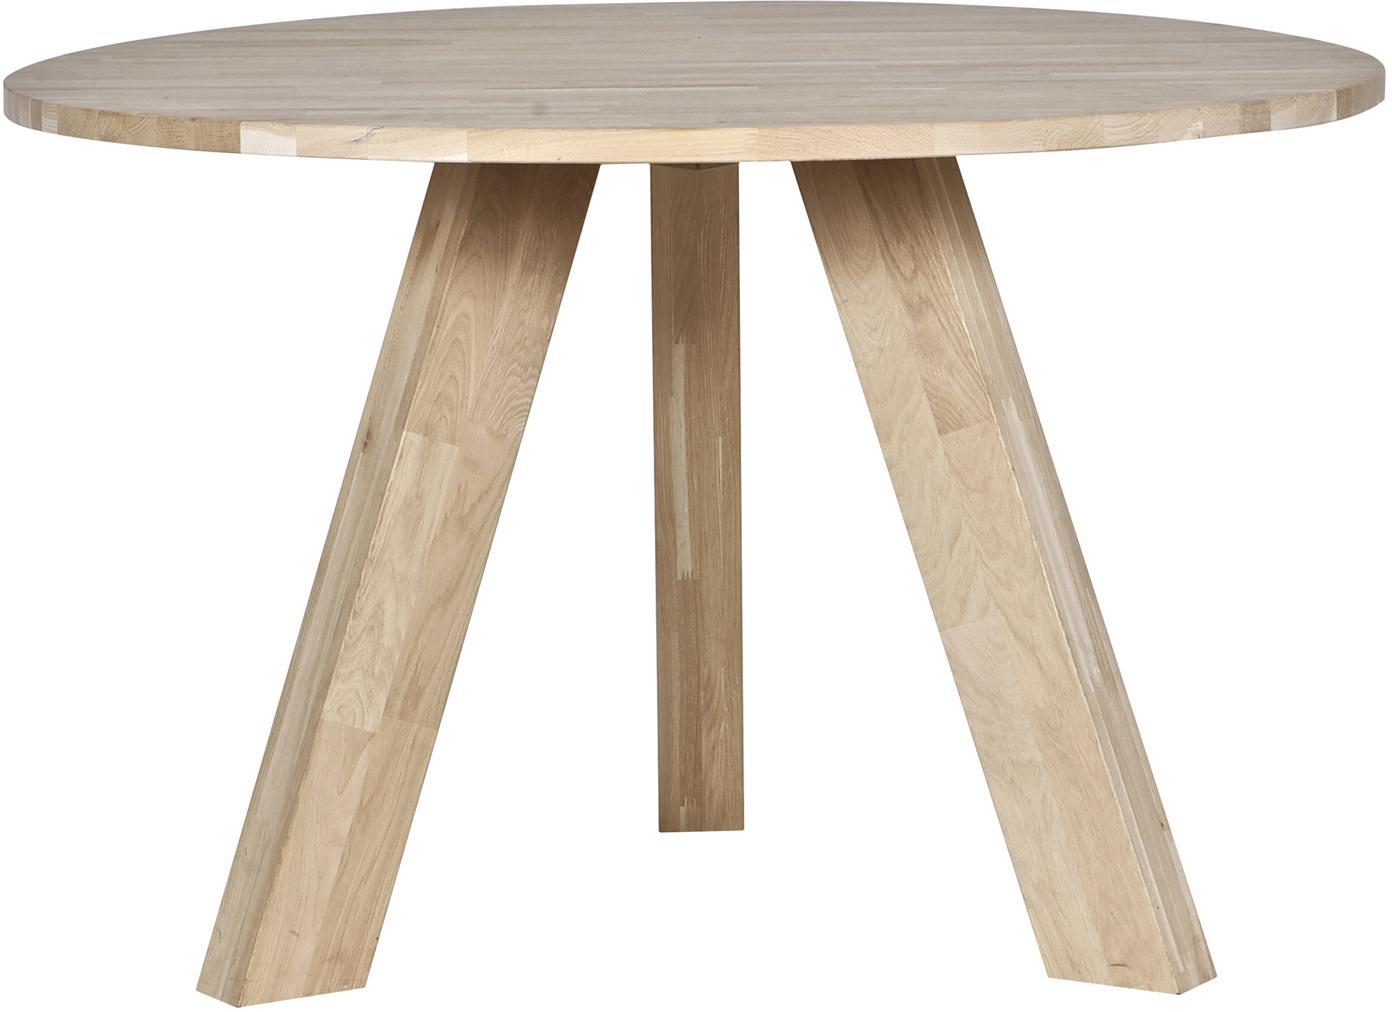 Ronde eettafel Rhonda van massief hout, Eikenhout, Eikenhoutkleurig, Ø 129 cm x H 75 cm